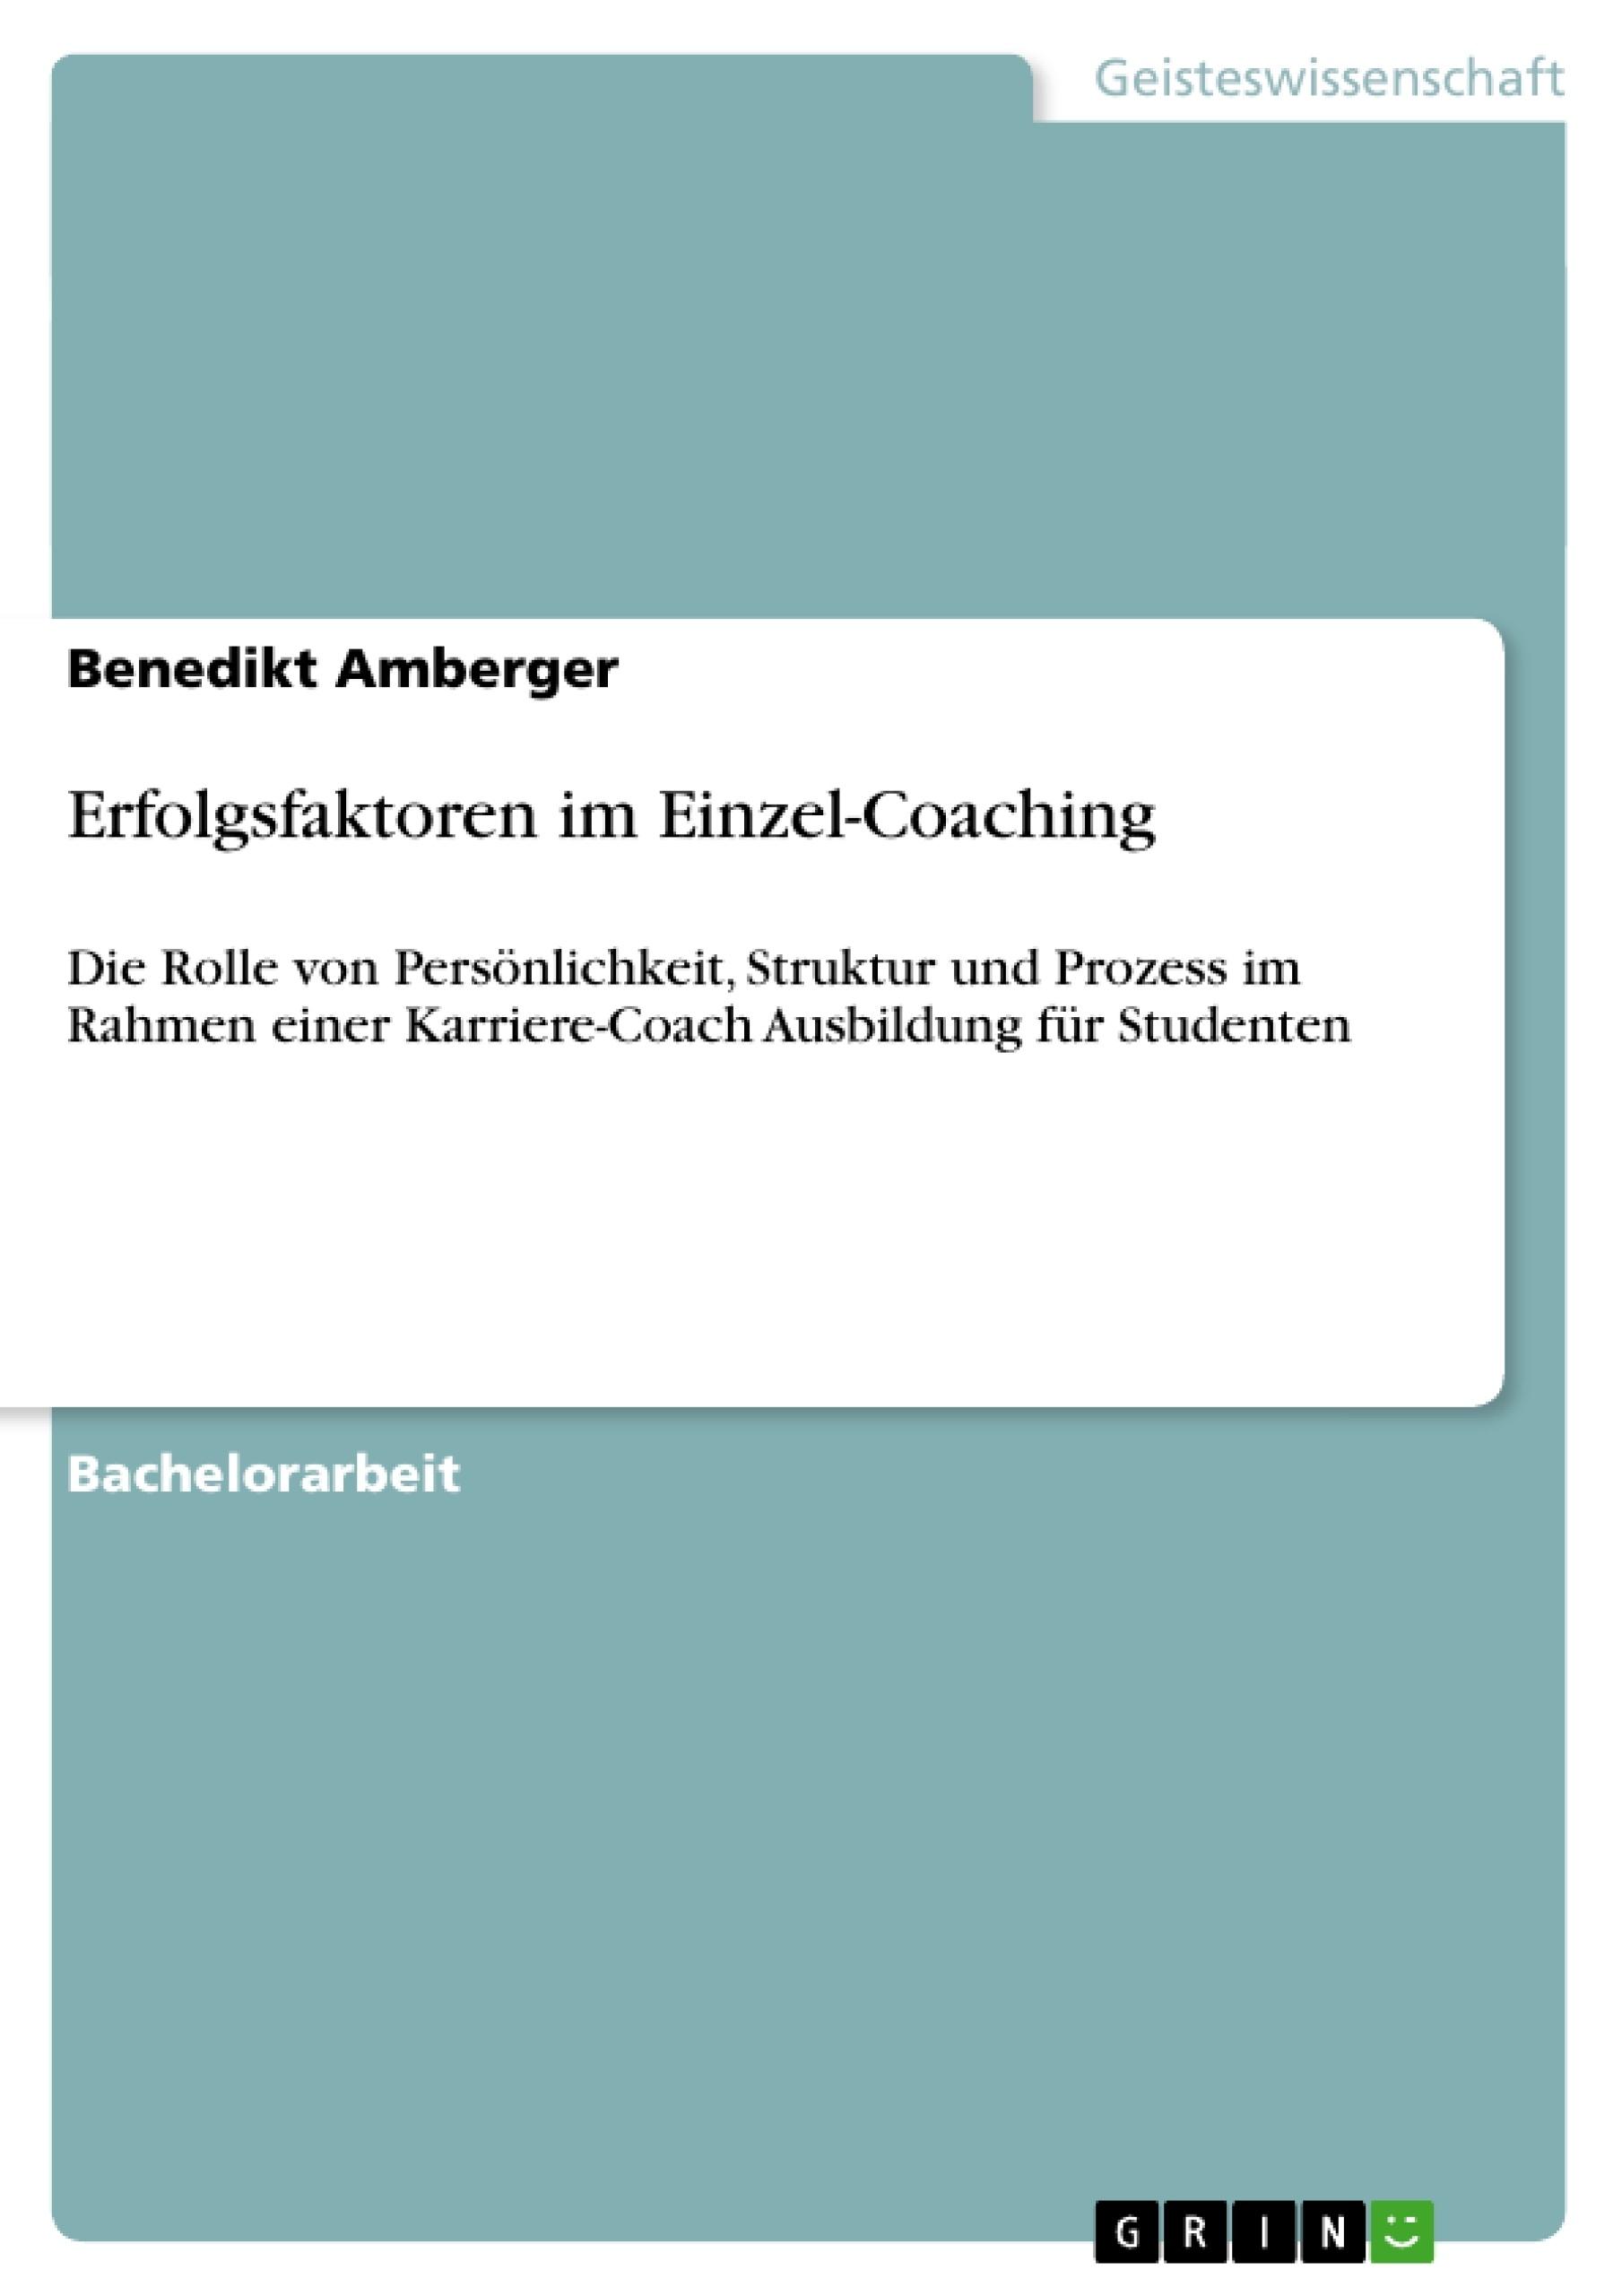 Titel: Erfolgsfaktoren im Einzel-Coaching